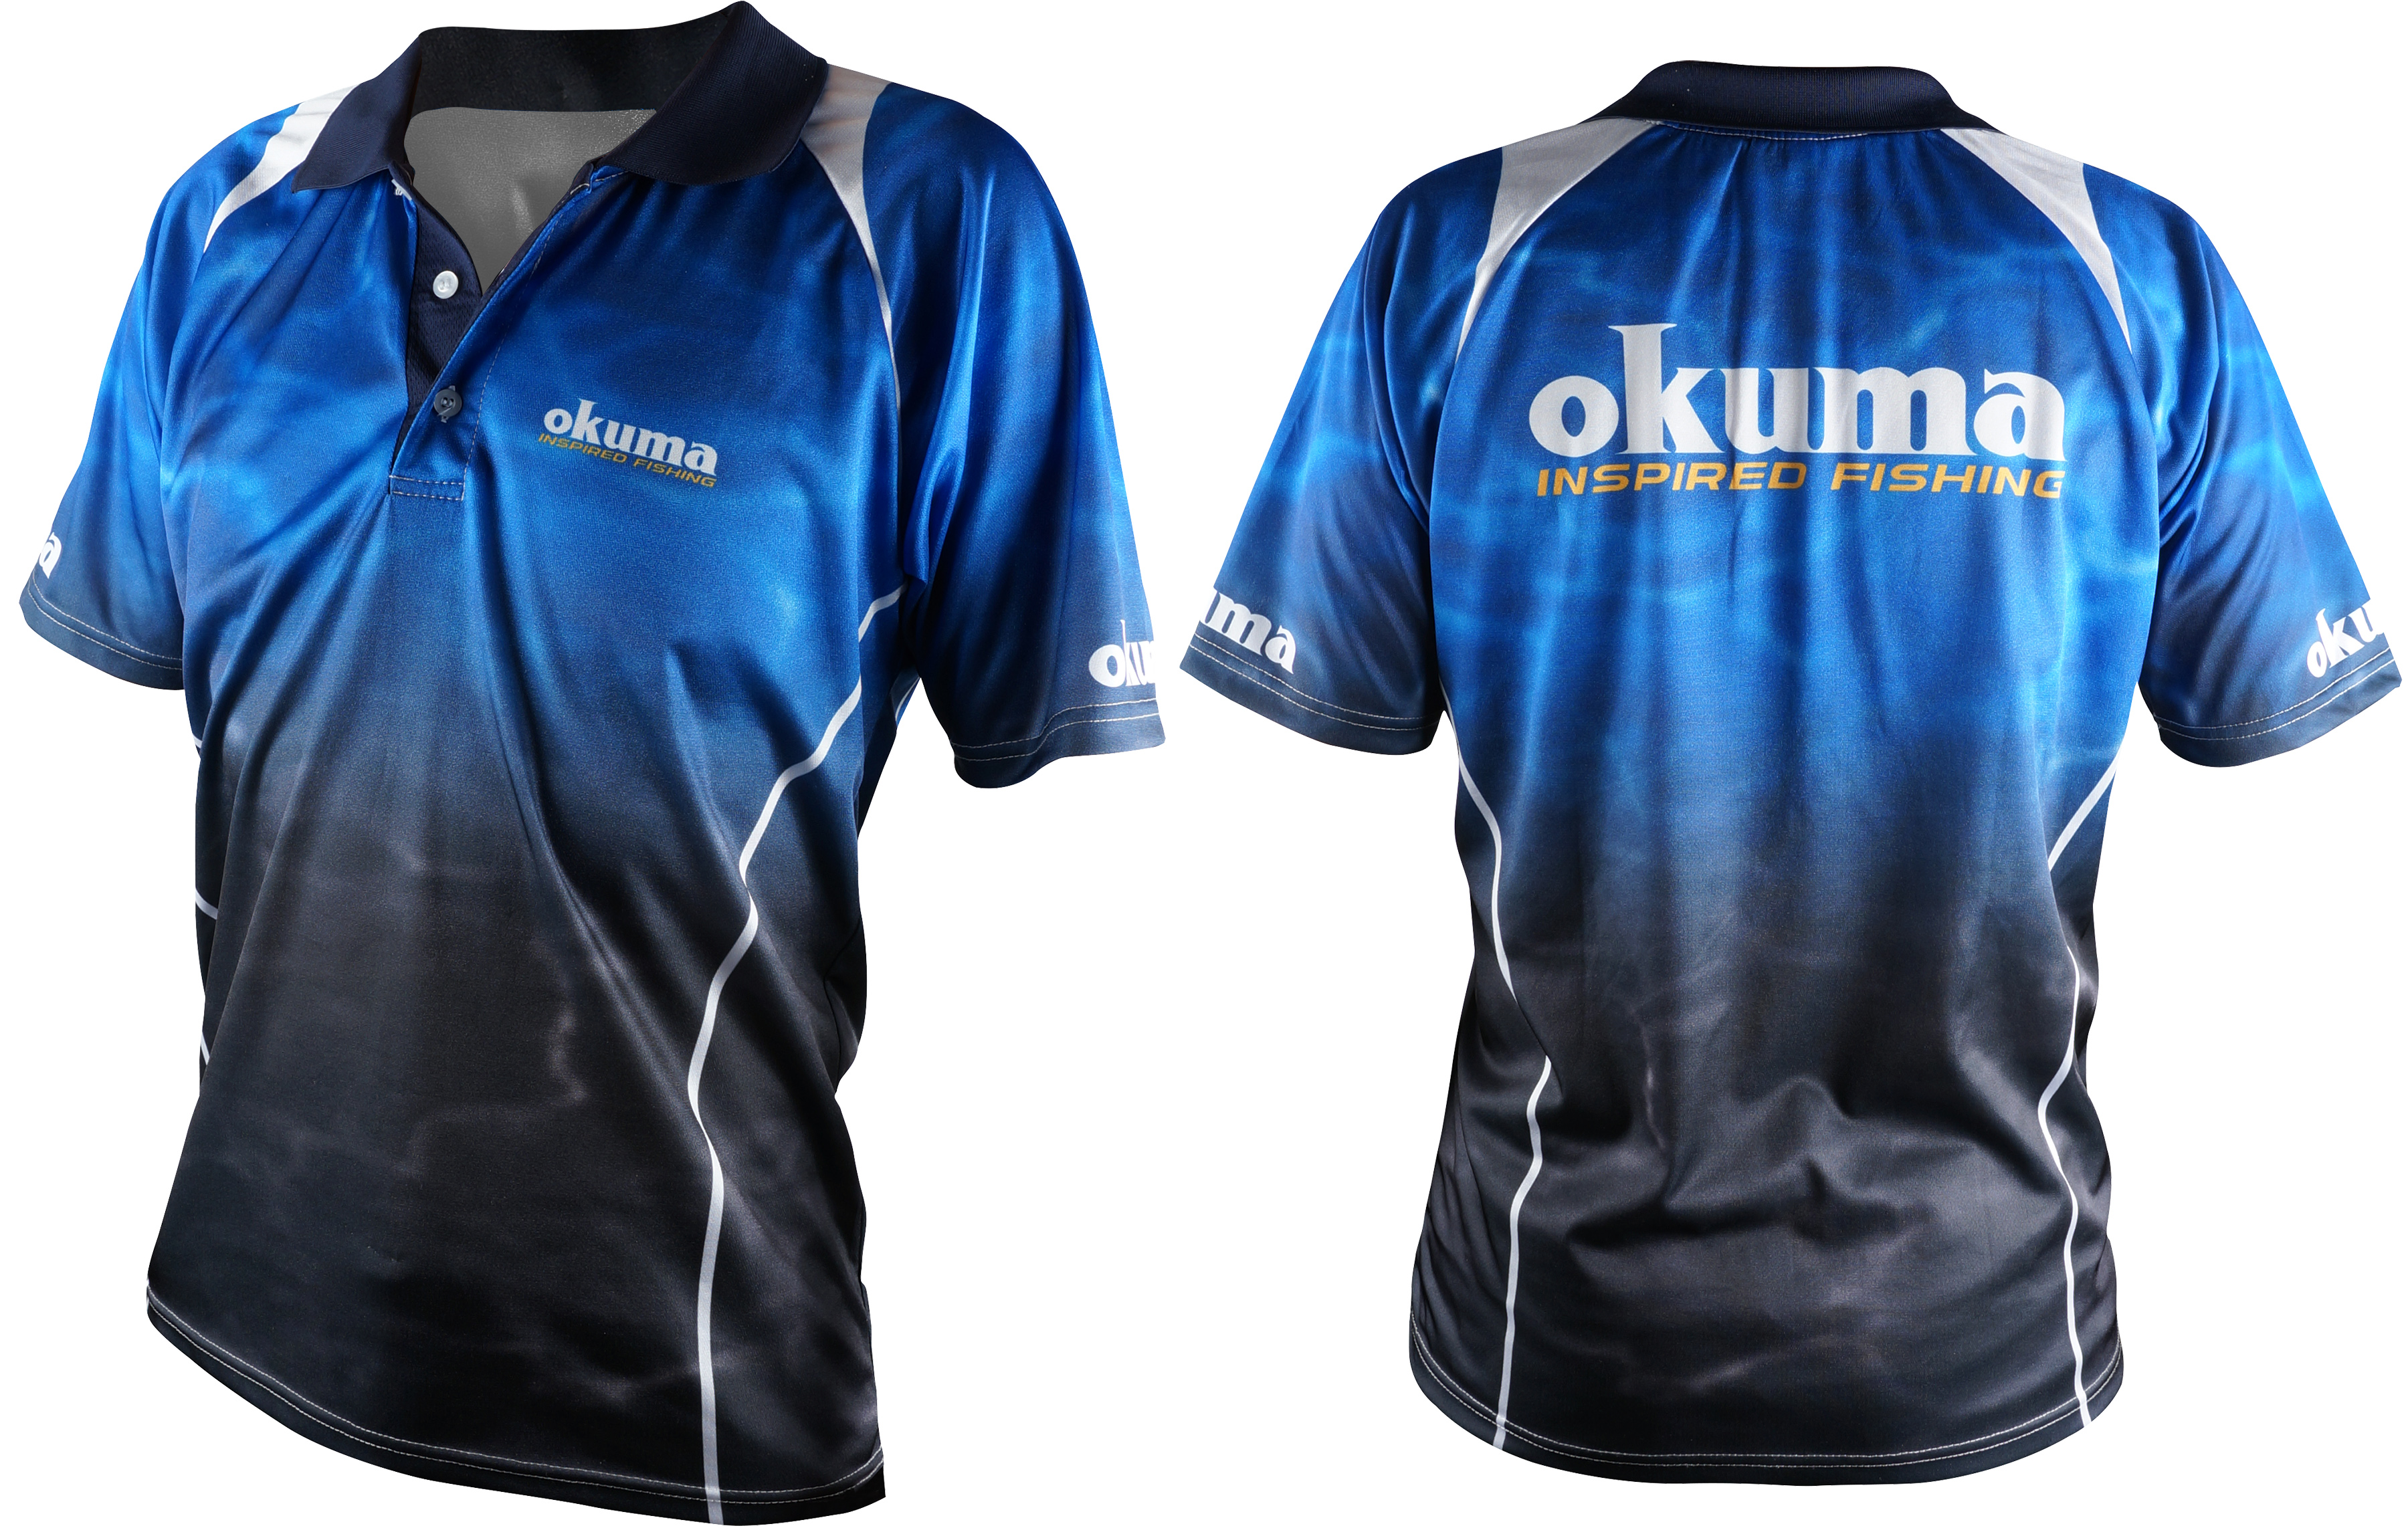 Kaos Okuma Blue Polo - Kaos Okuma Blue Polo